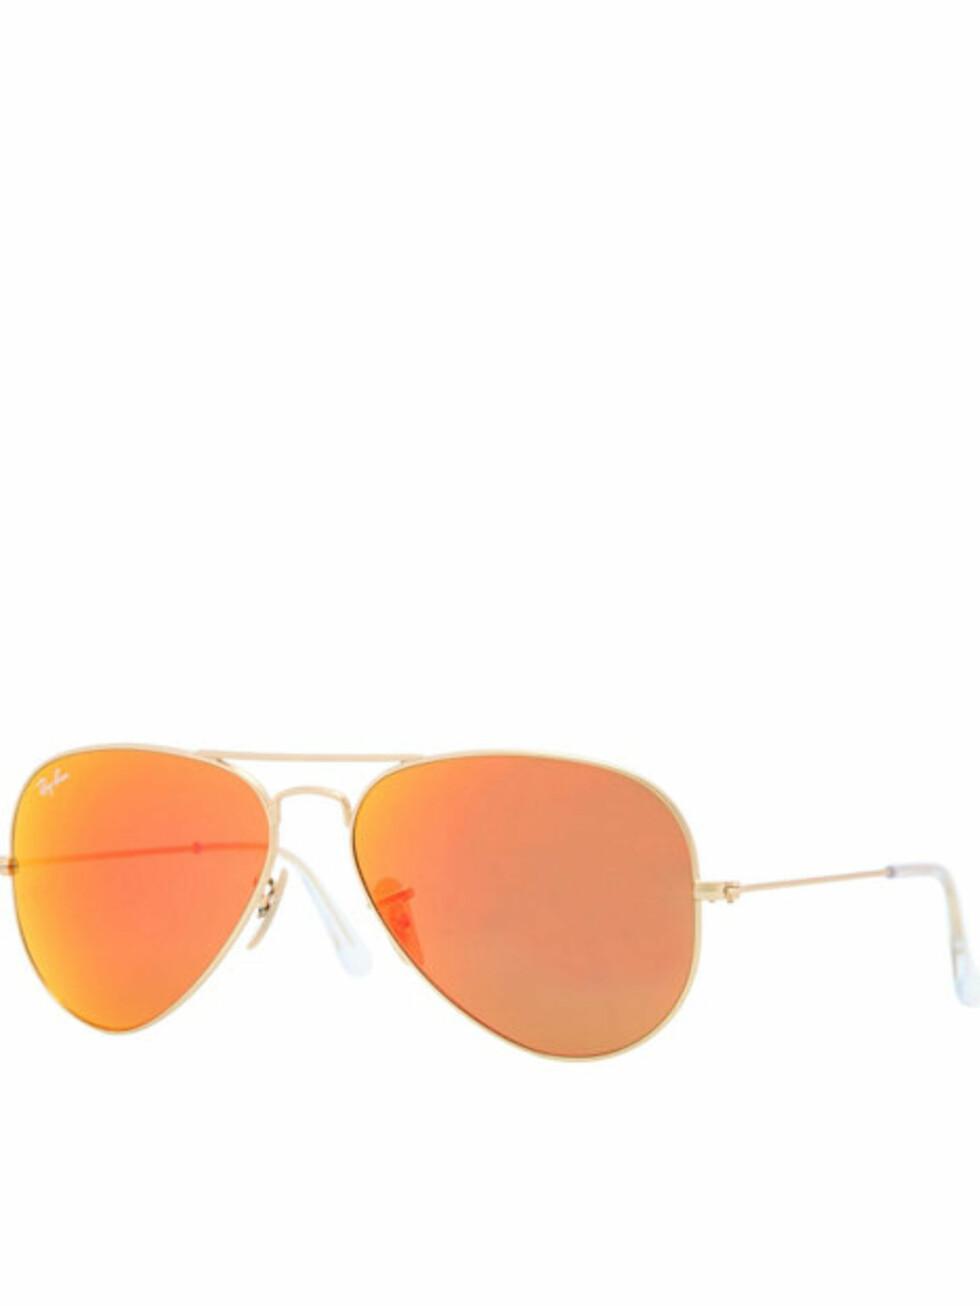 Solbriller fra Ray Ban via Nelly.com | kr 1749 | http://my.nelly.com/link/click/21265